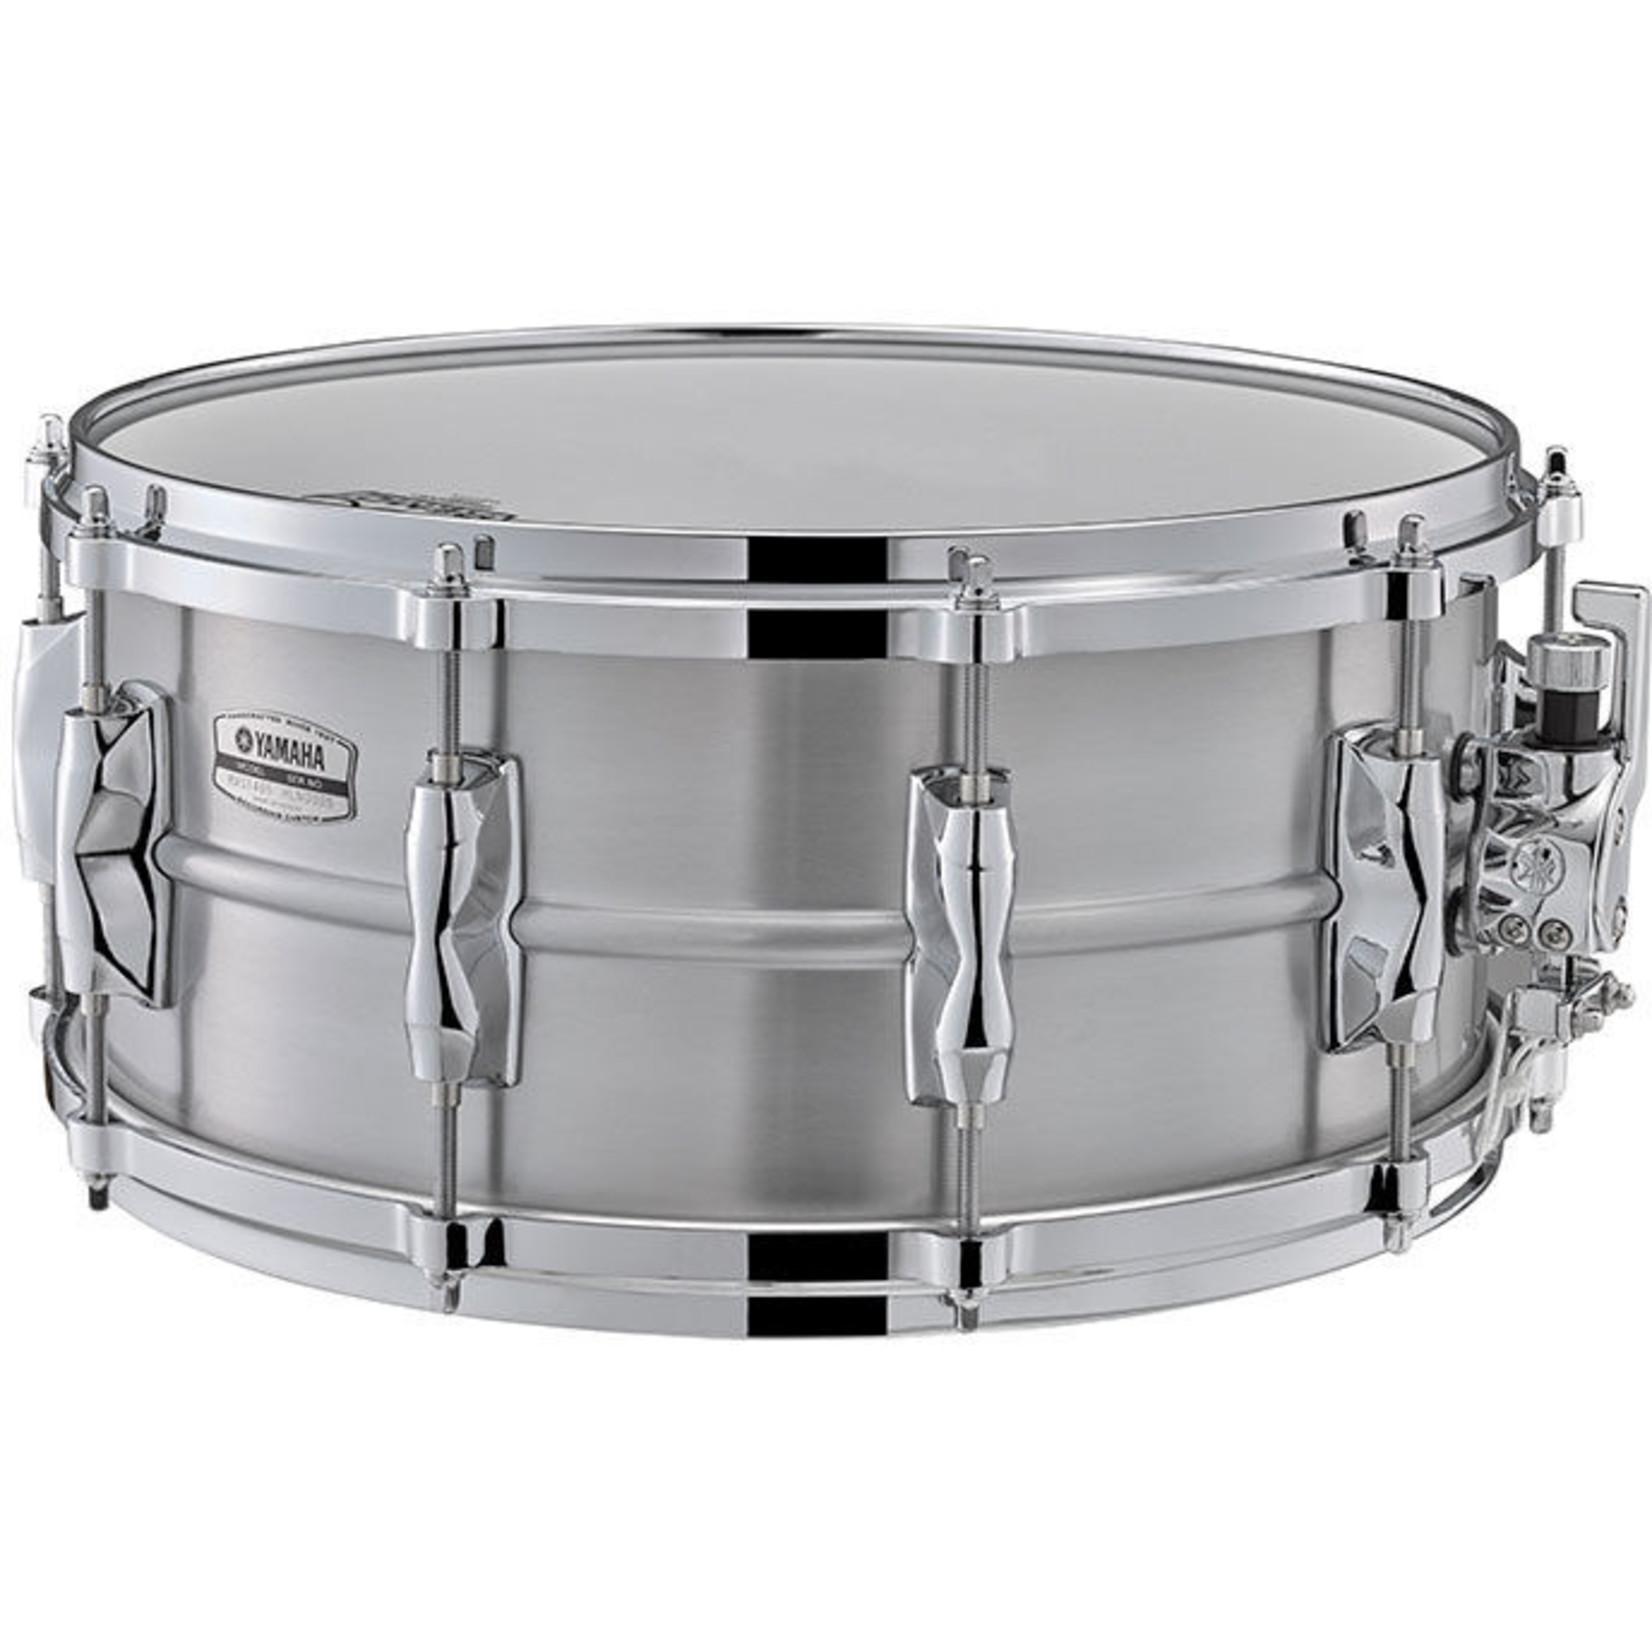 "Yamaha Yamaha 6.5x14 Recording Custom ""Aluminum"" Snare Drum"